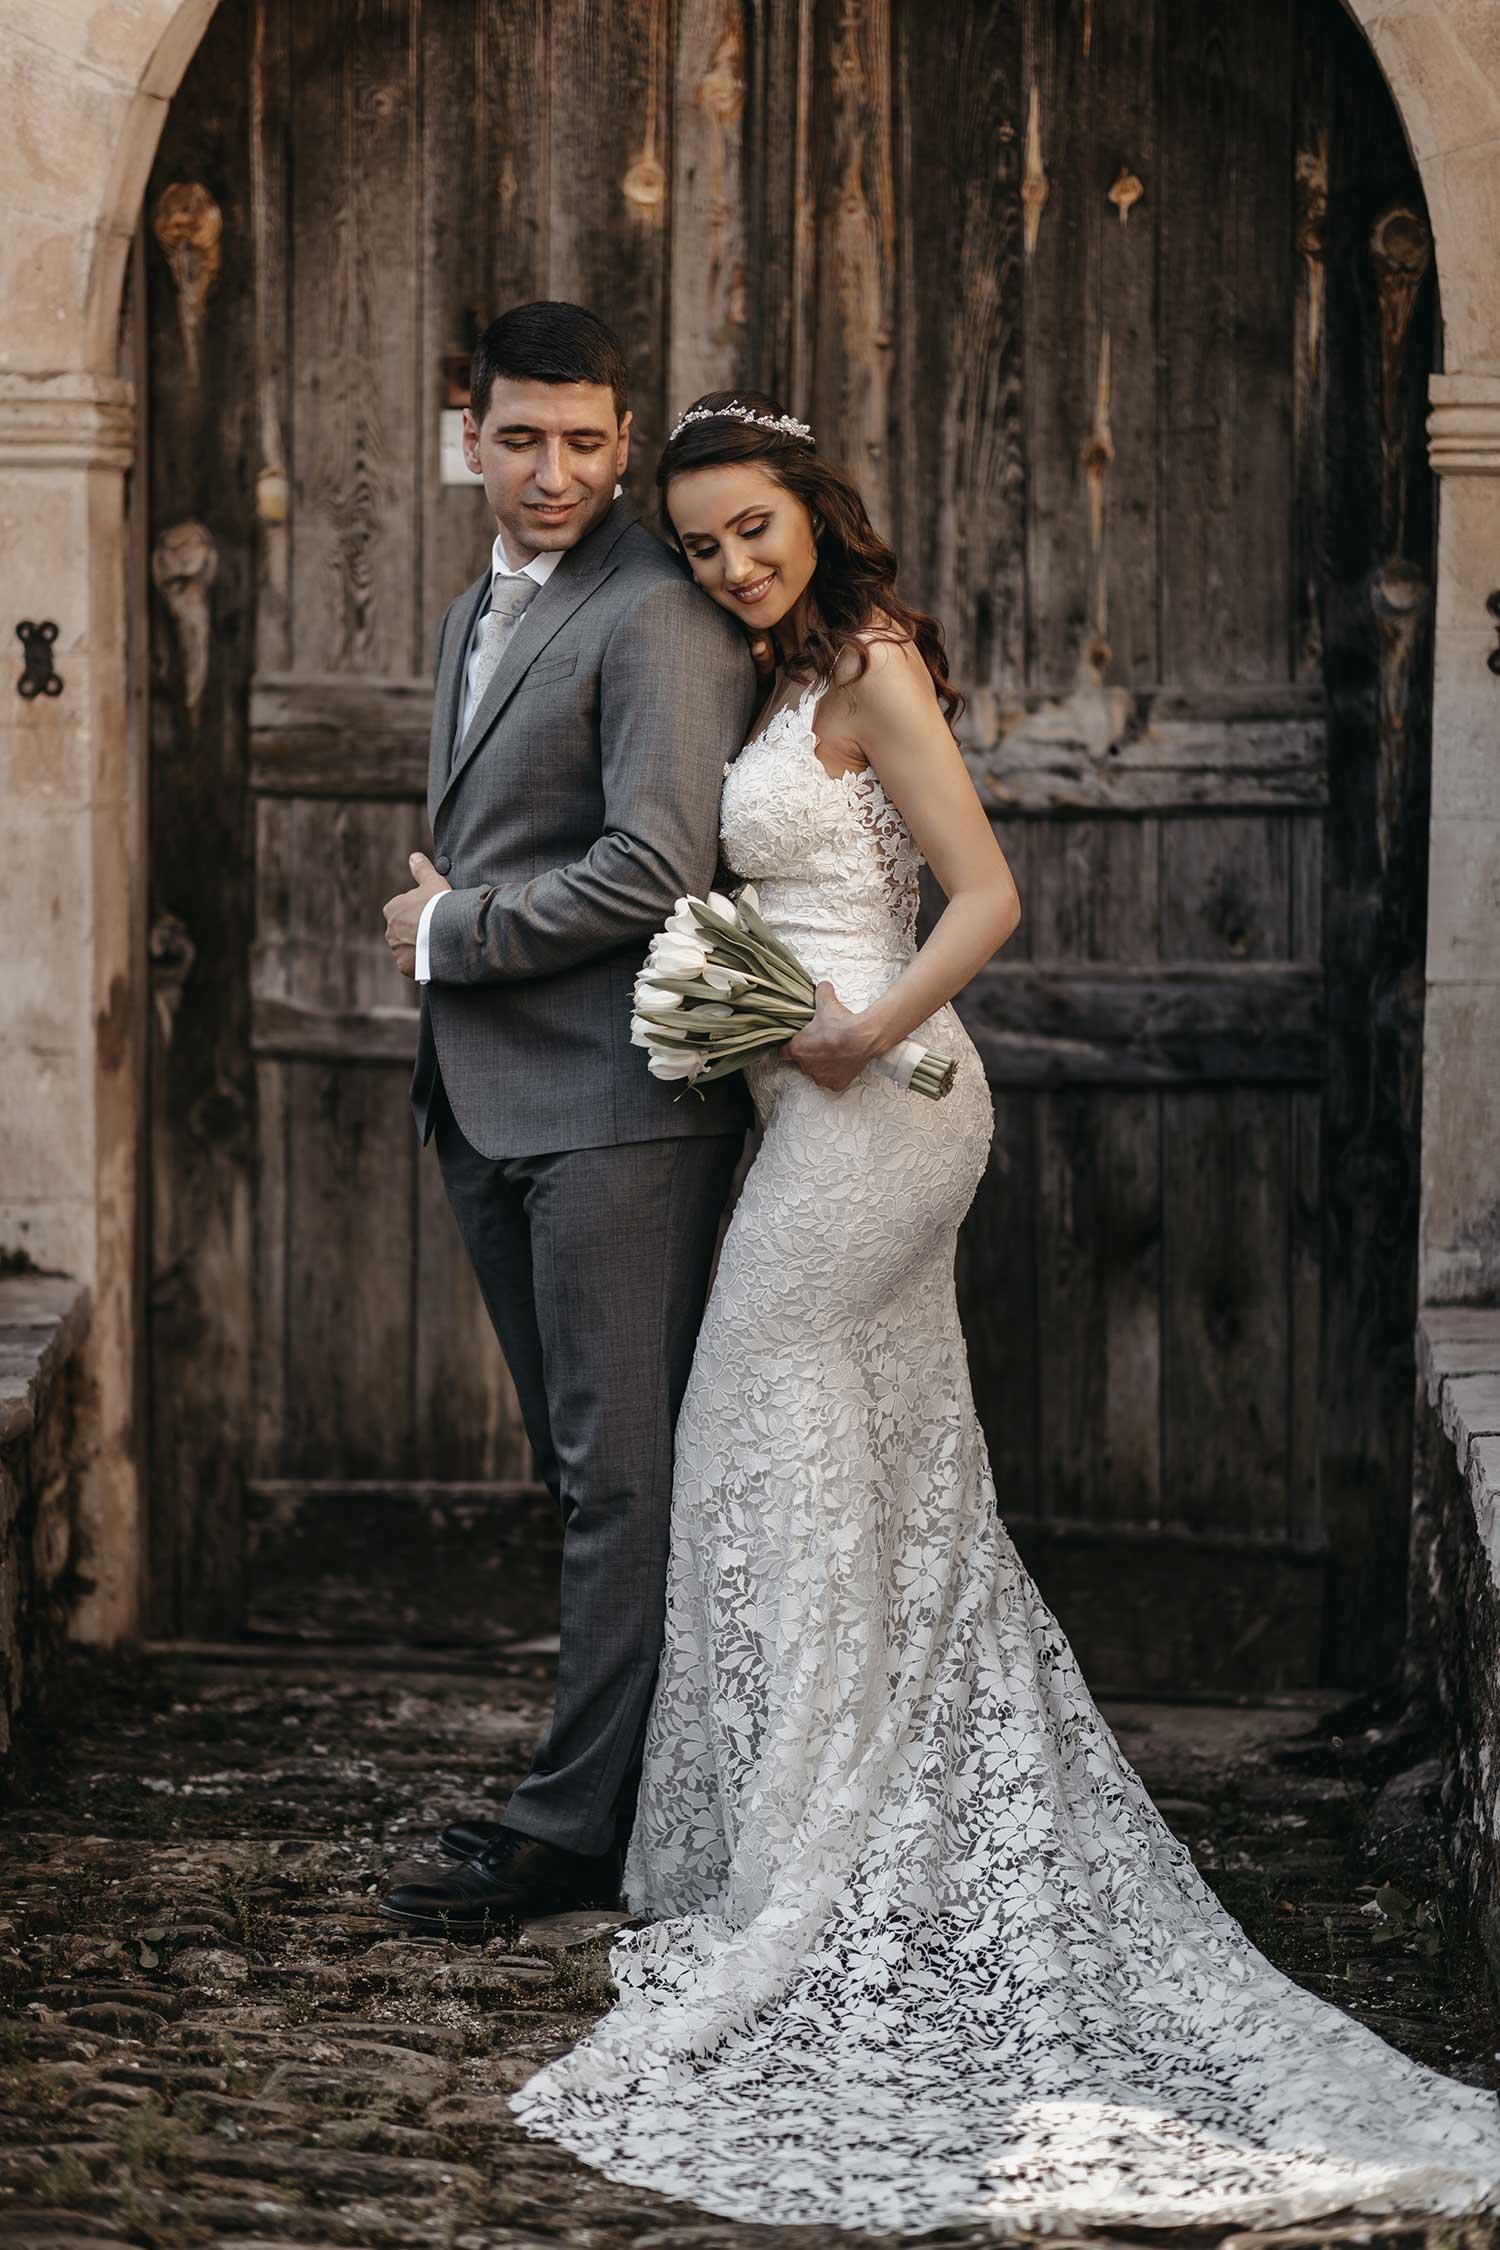 Couple posing in front of an old door